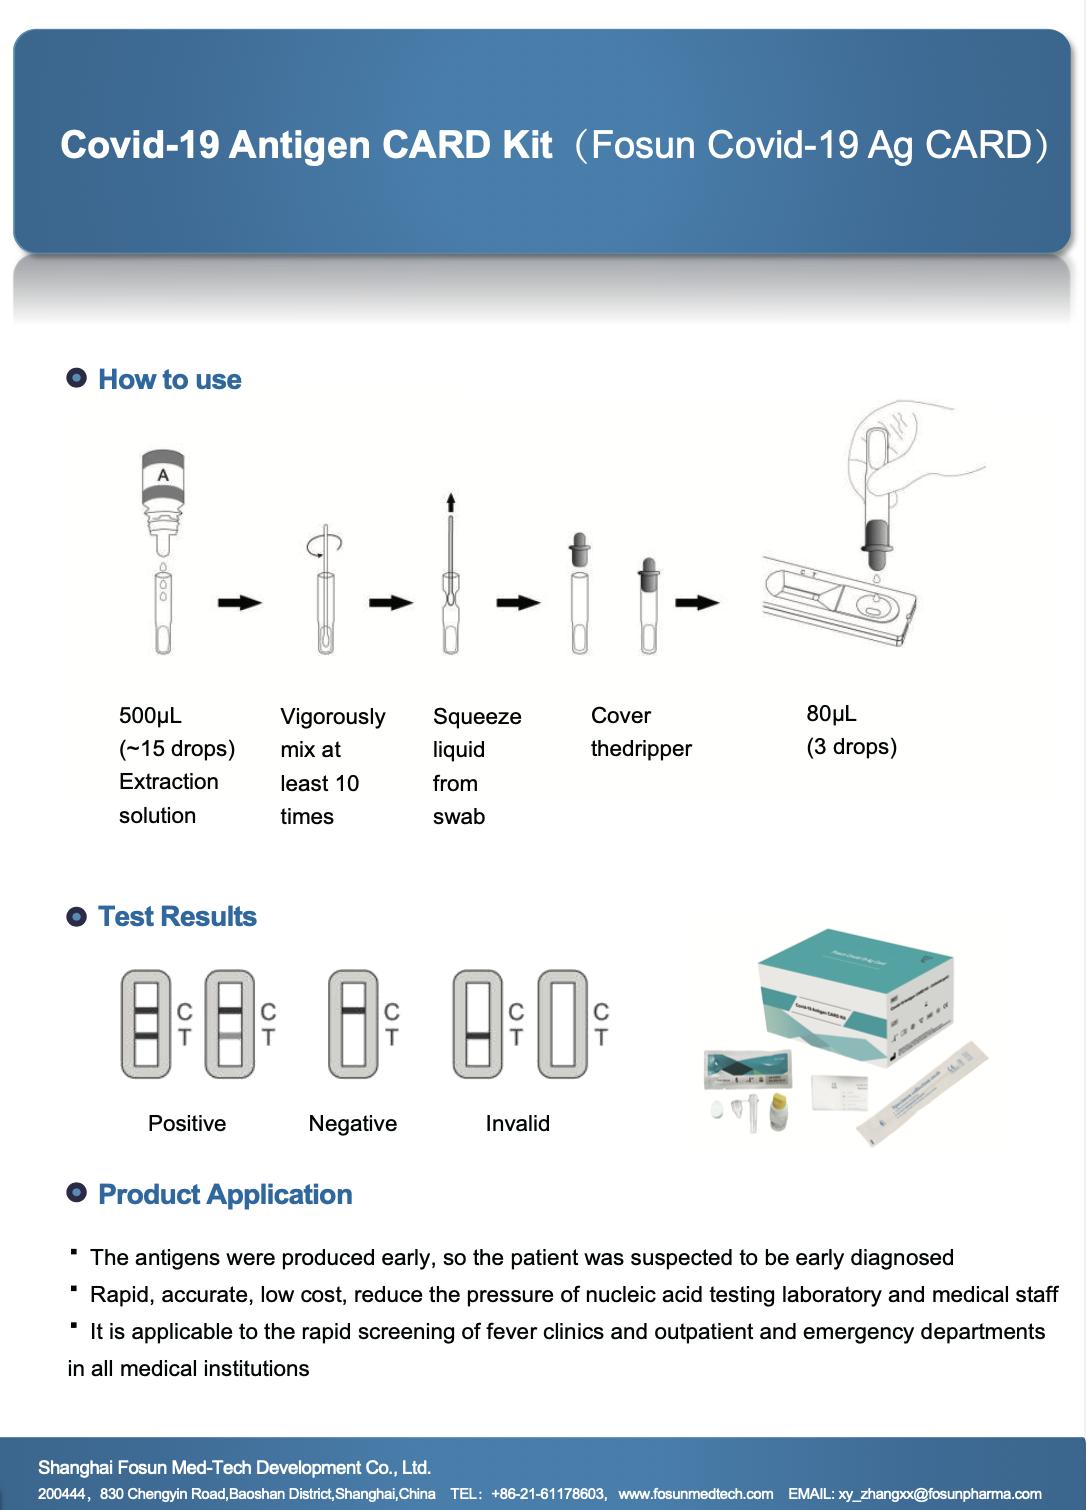 Covid-19 Antigen CARD Kit(Fosun Covid-19 Ag CARD)